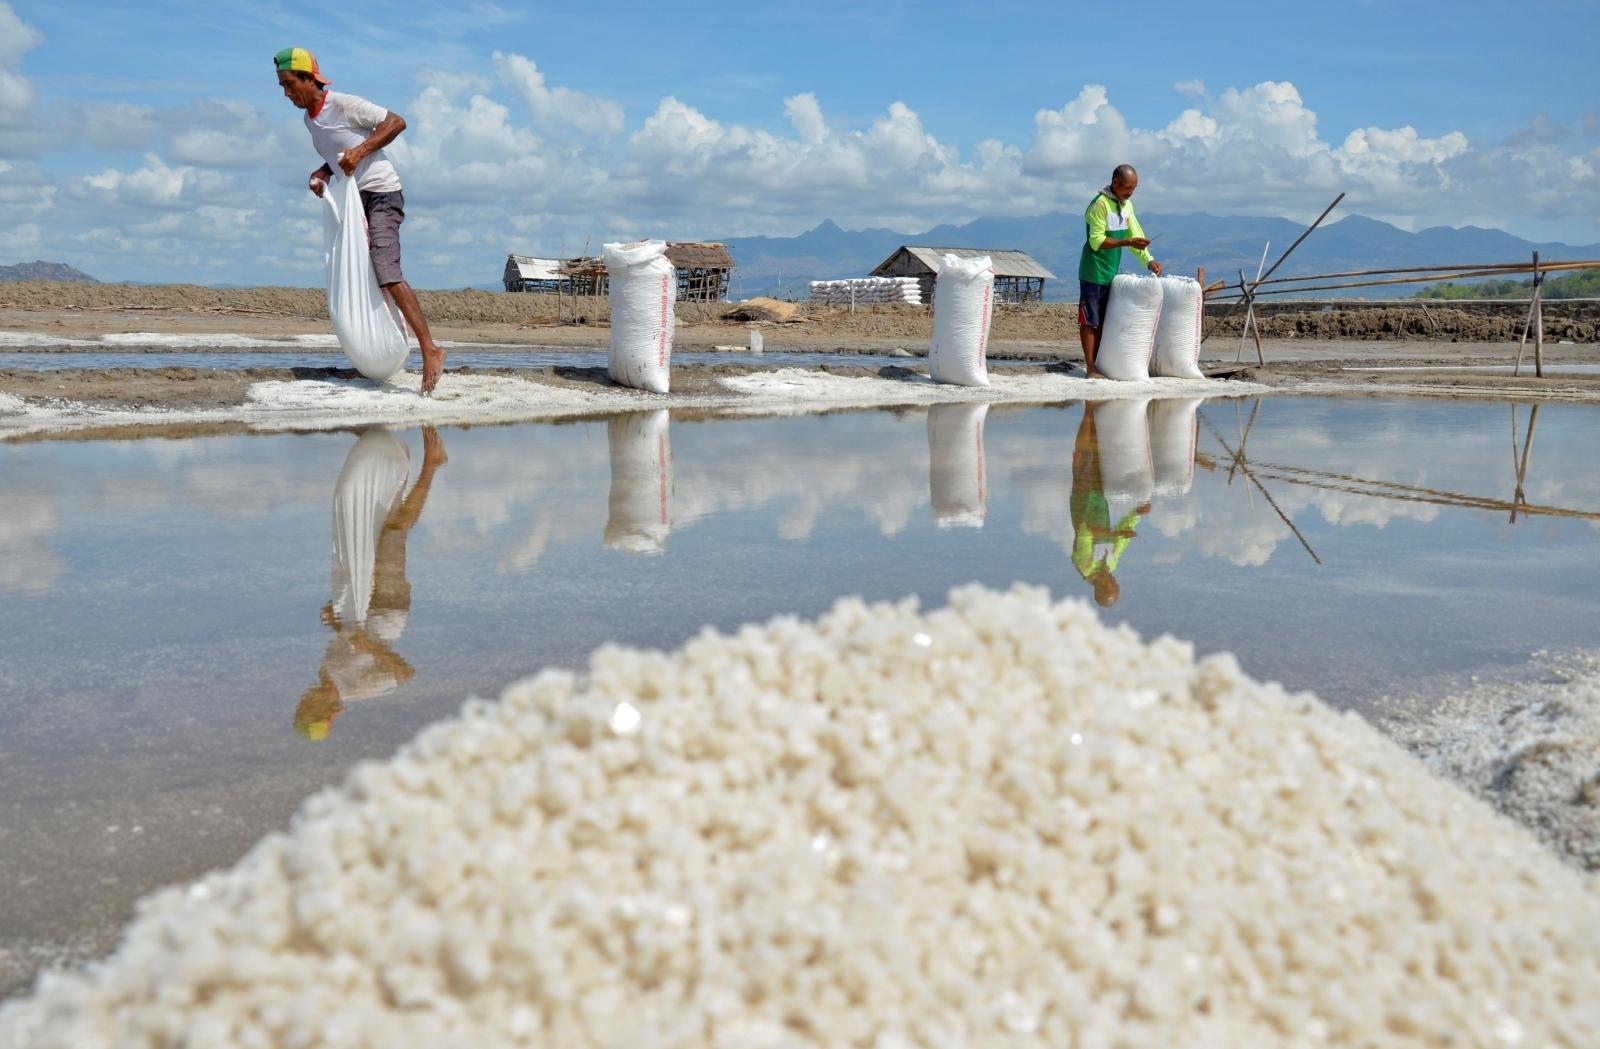 Indonesia salt scarcity